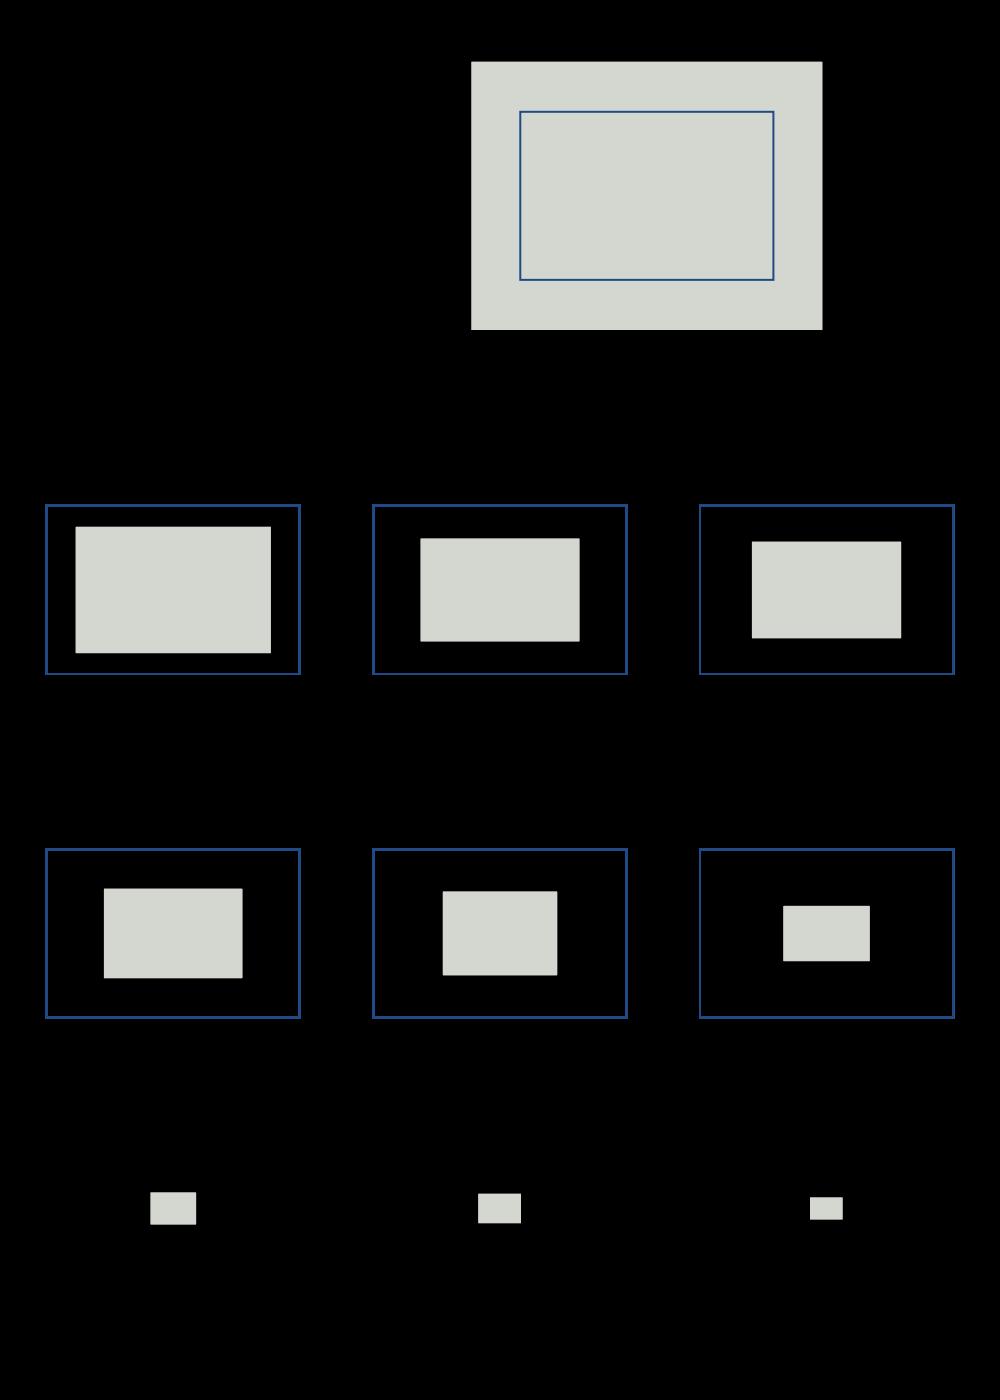 Wiki_SensorSizes